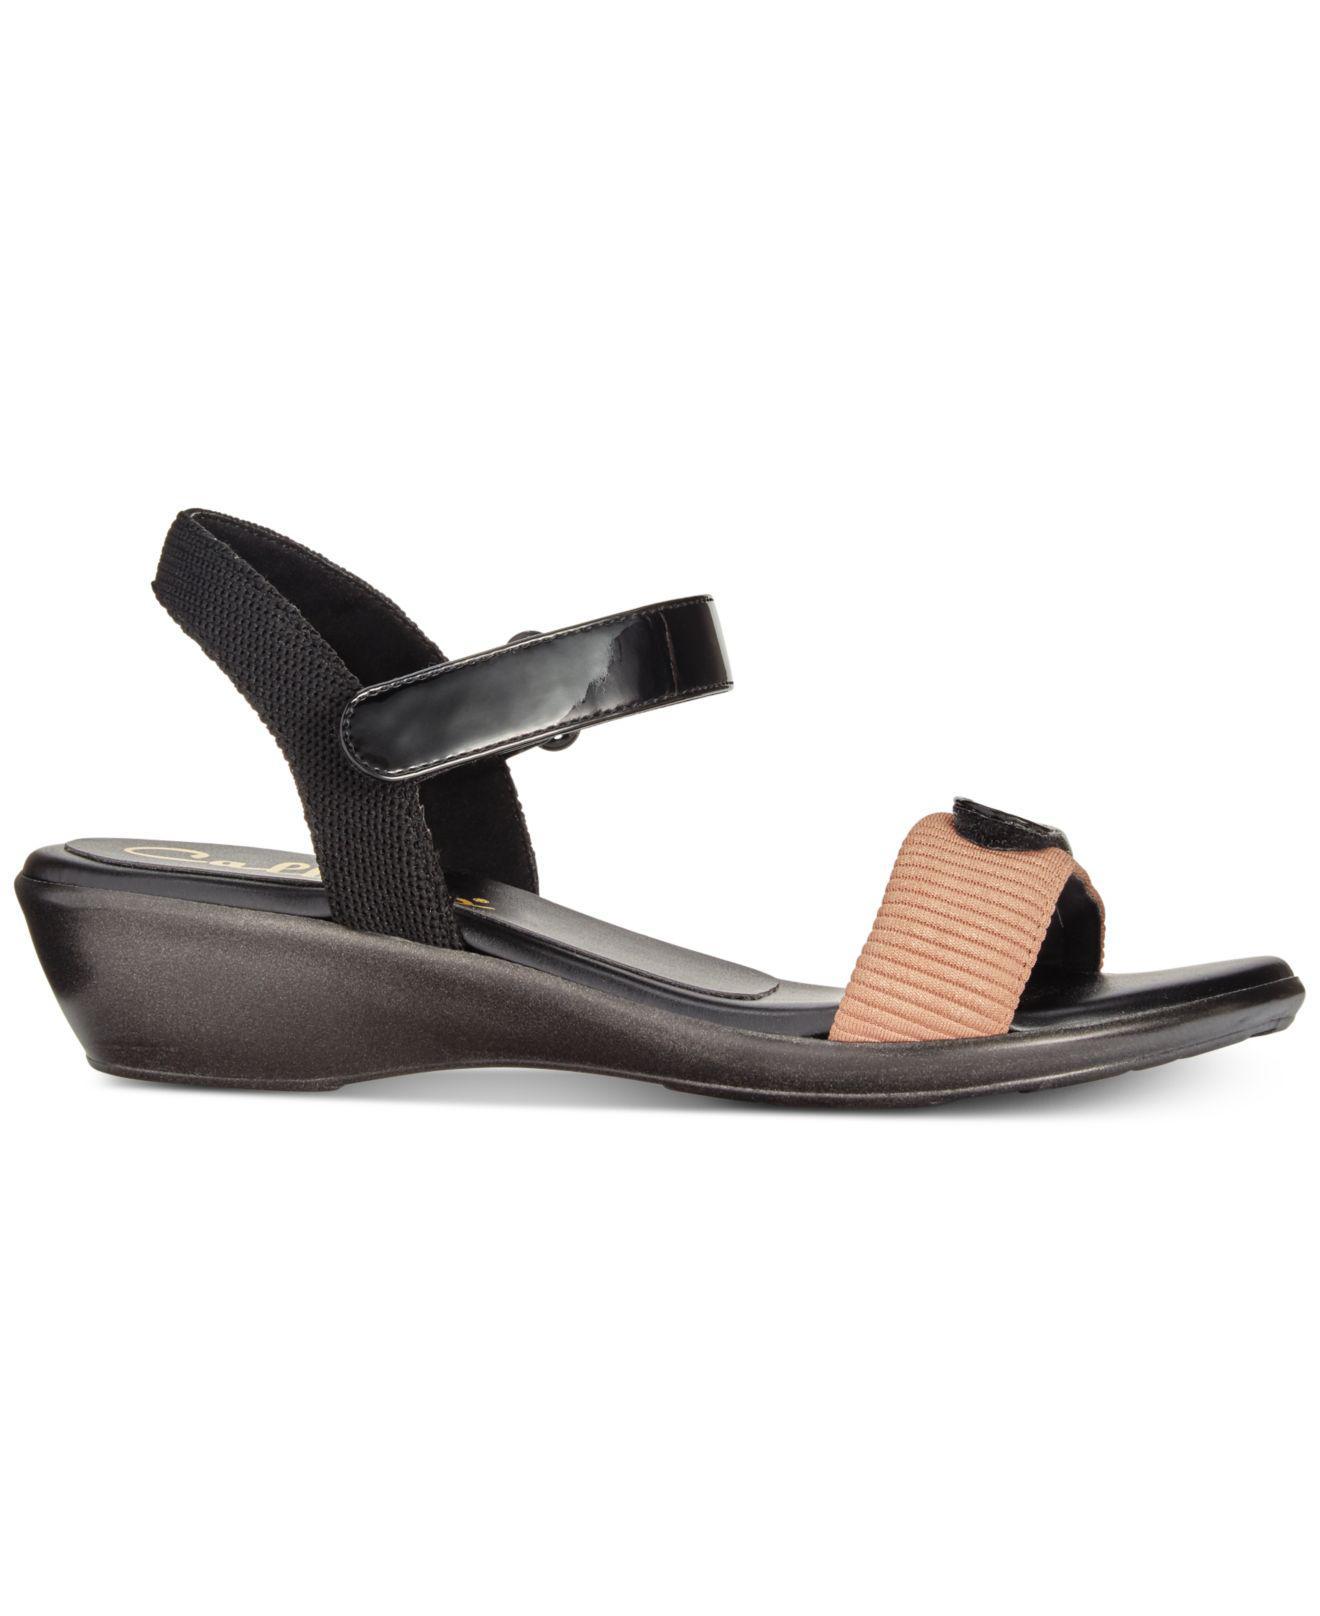 9618568655b6 Lyst - Callisto Simba Wedge Sandals